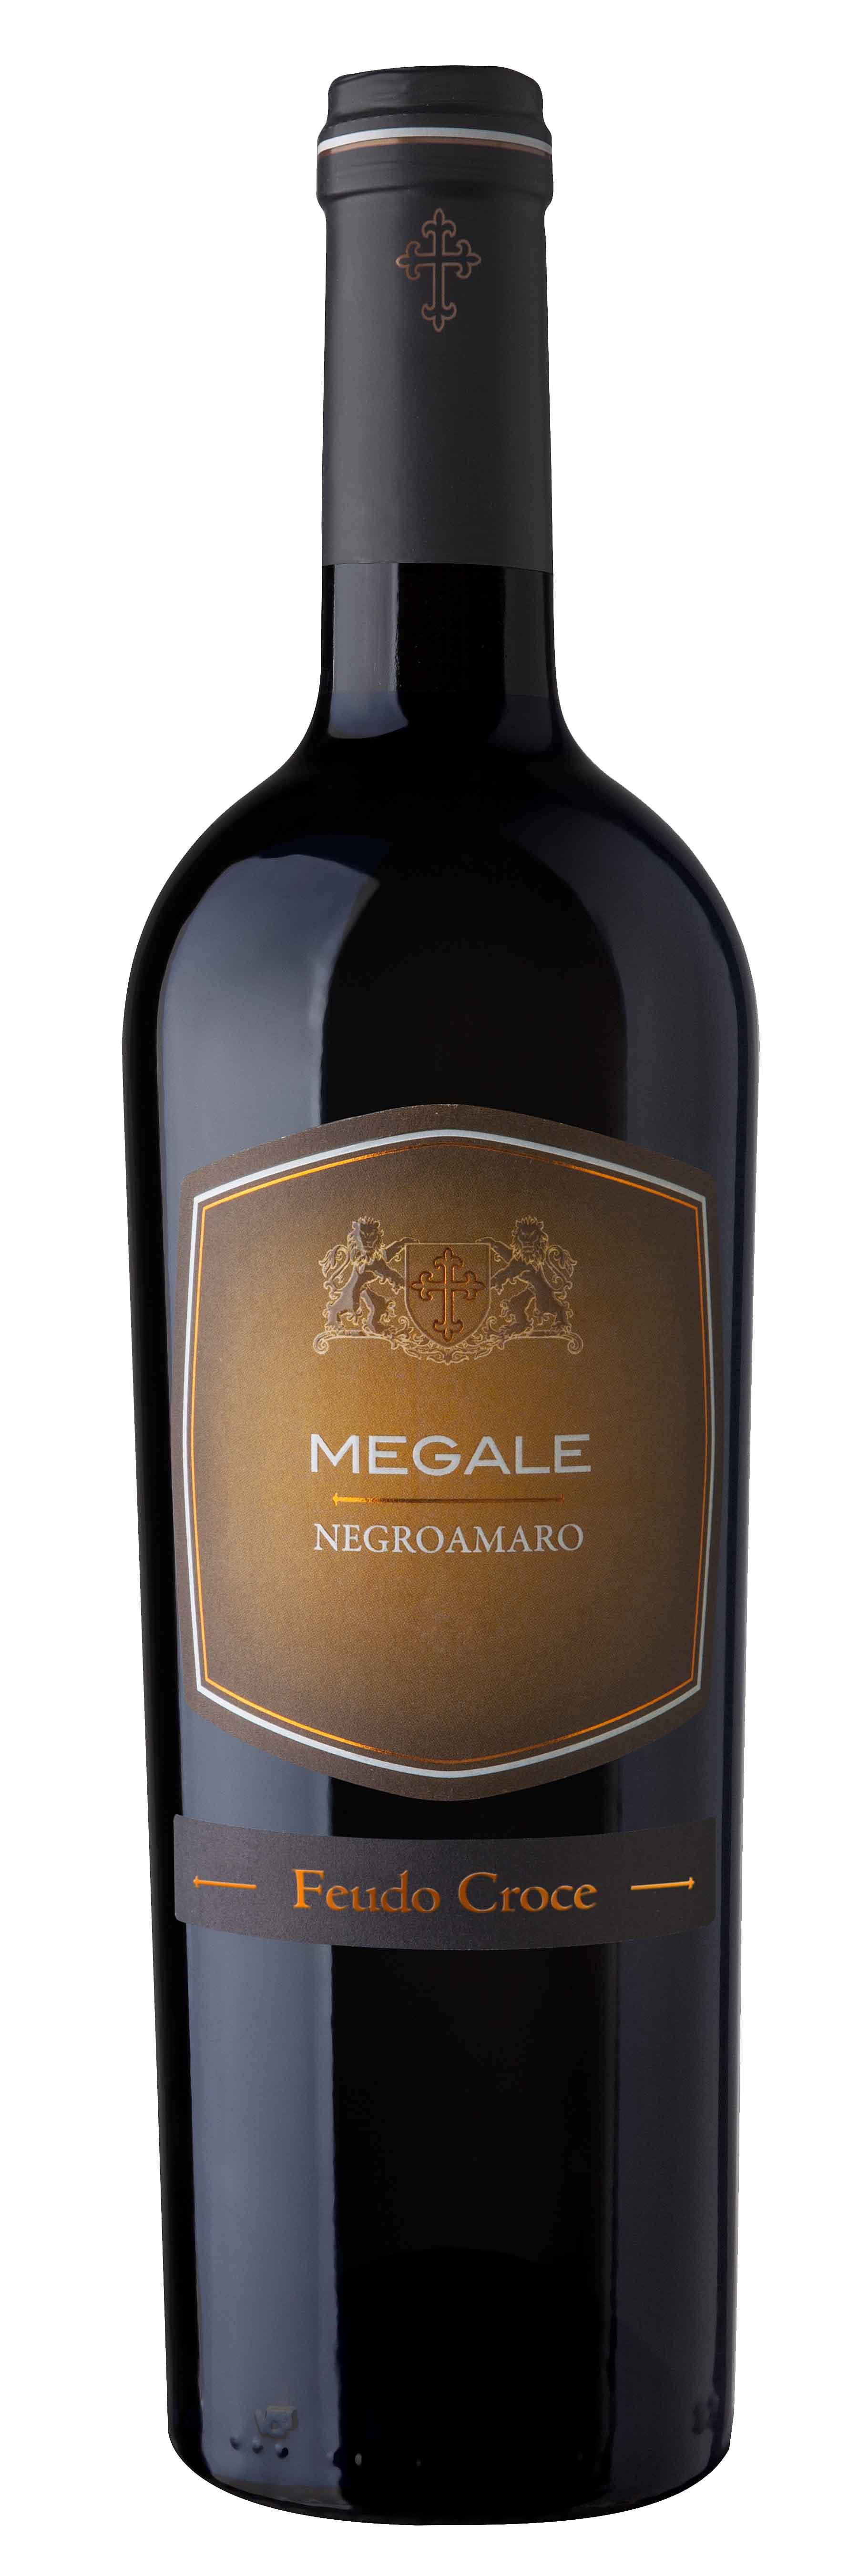 Feudo Croce - Negroamaro Megale IGP 2018